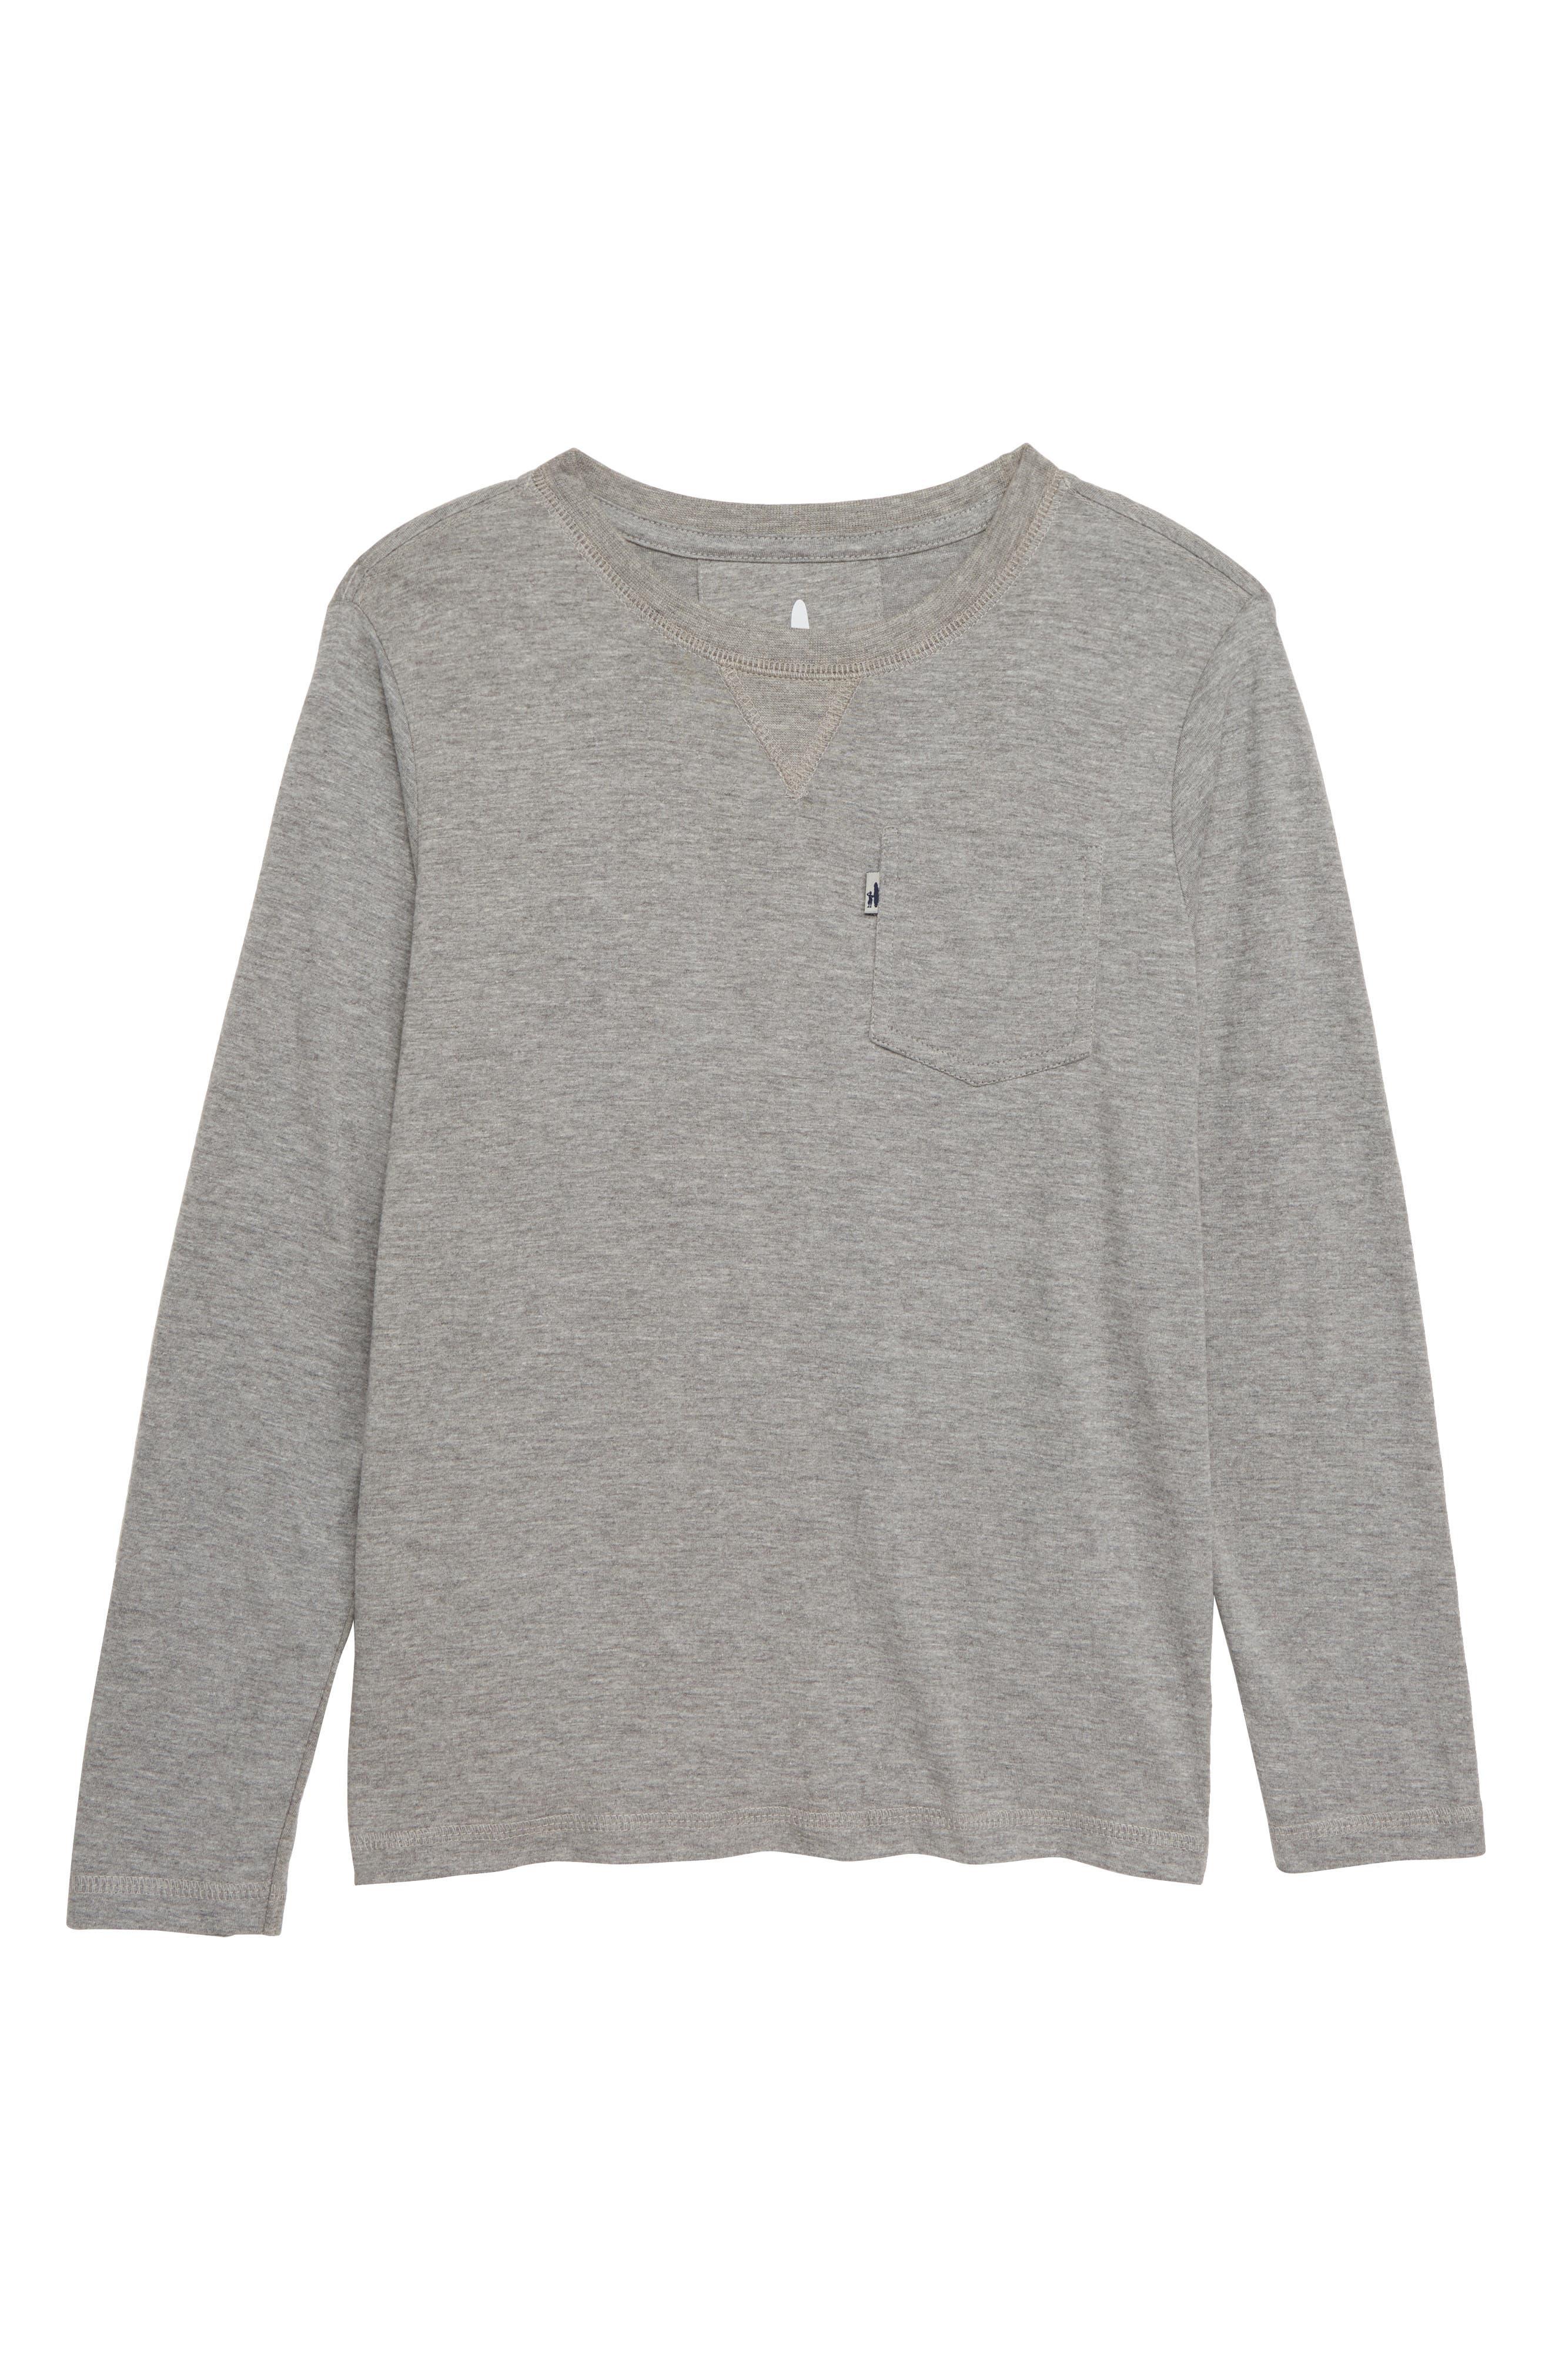 Boys JohnnieO Matty LongSleeve Pocket TShirt Size 10  White